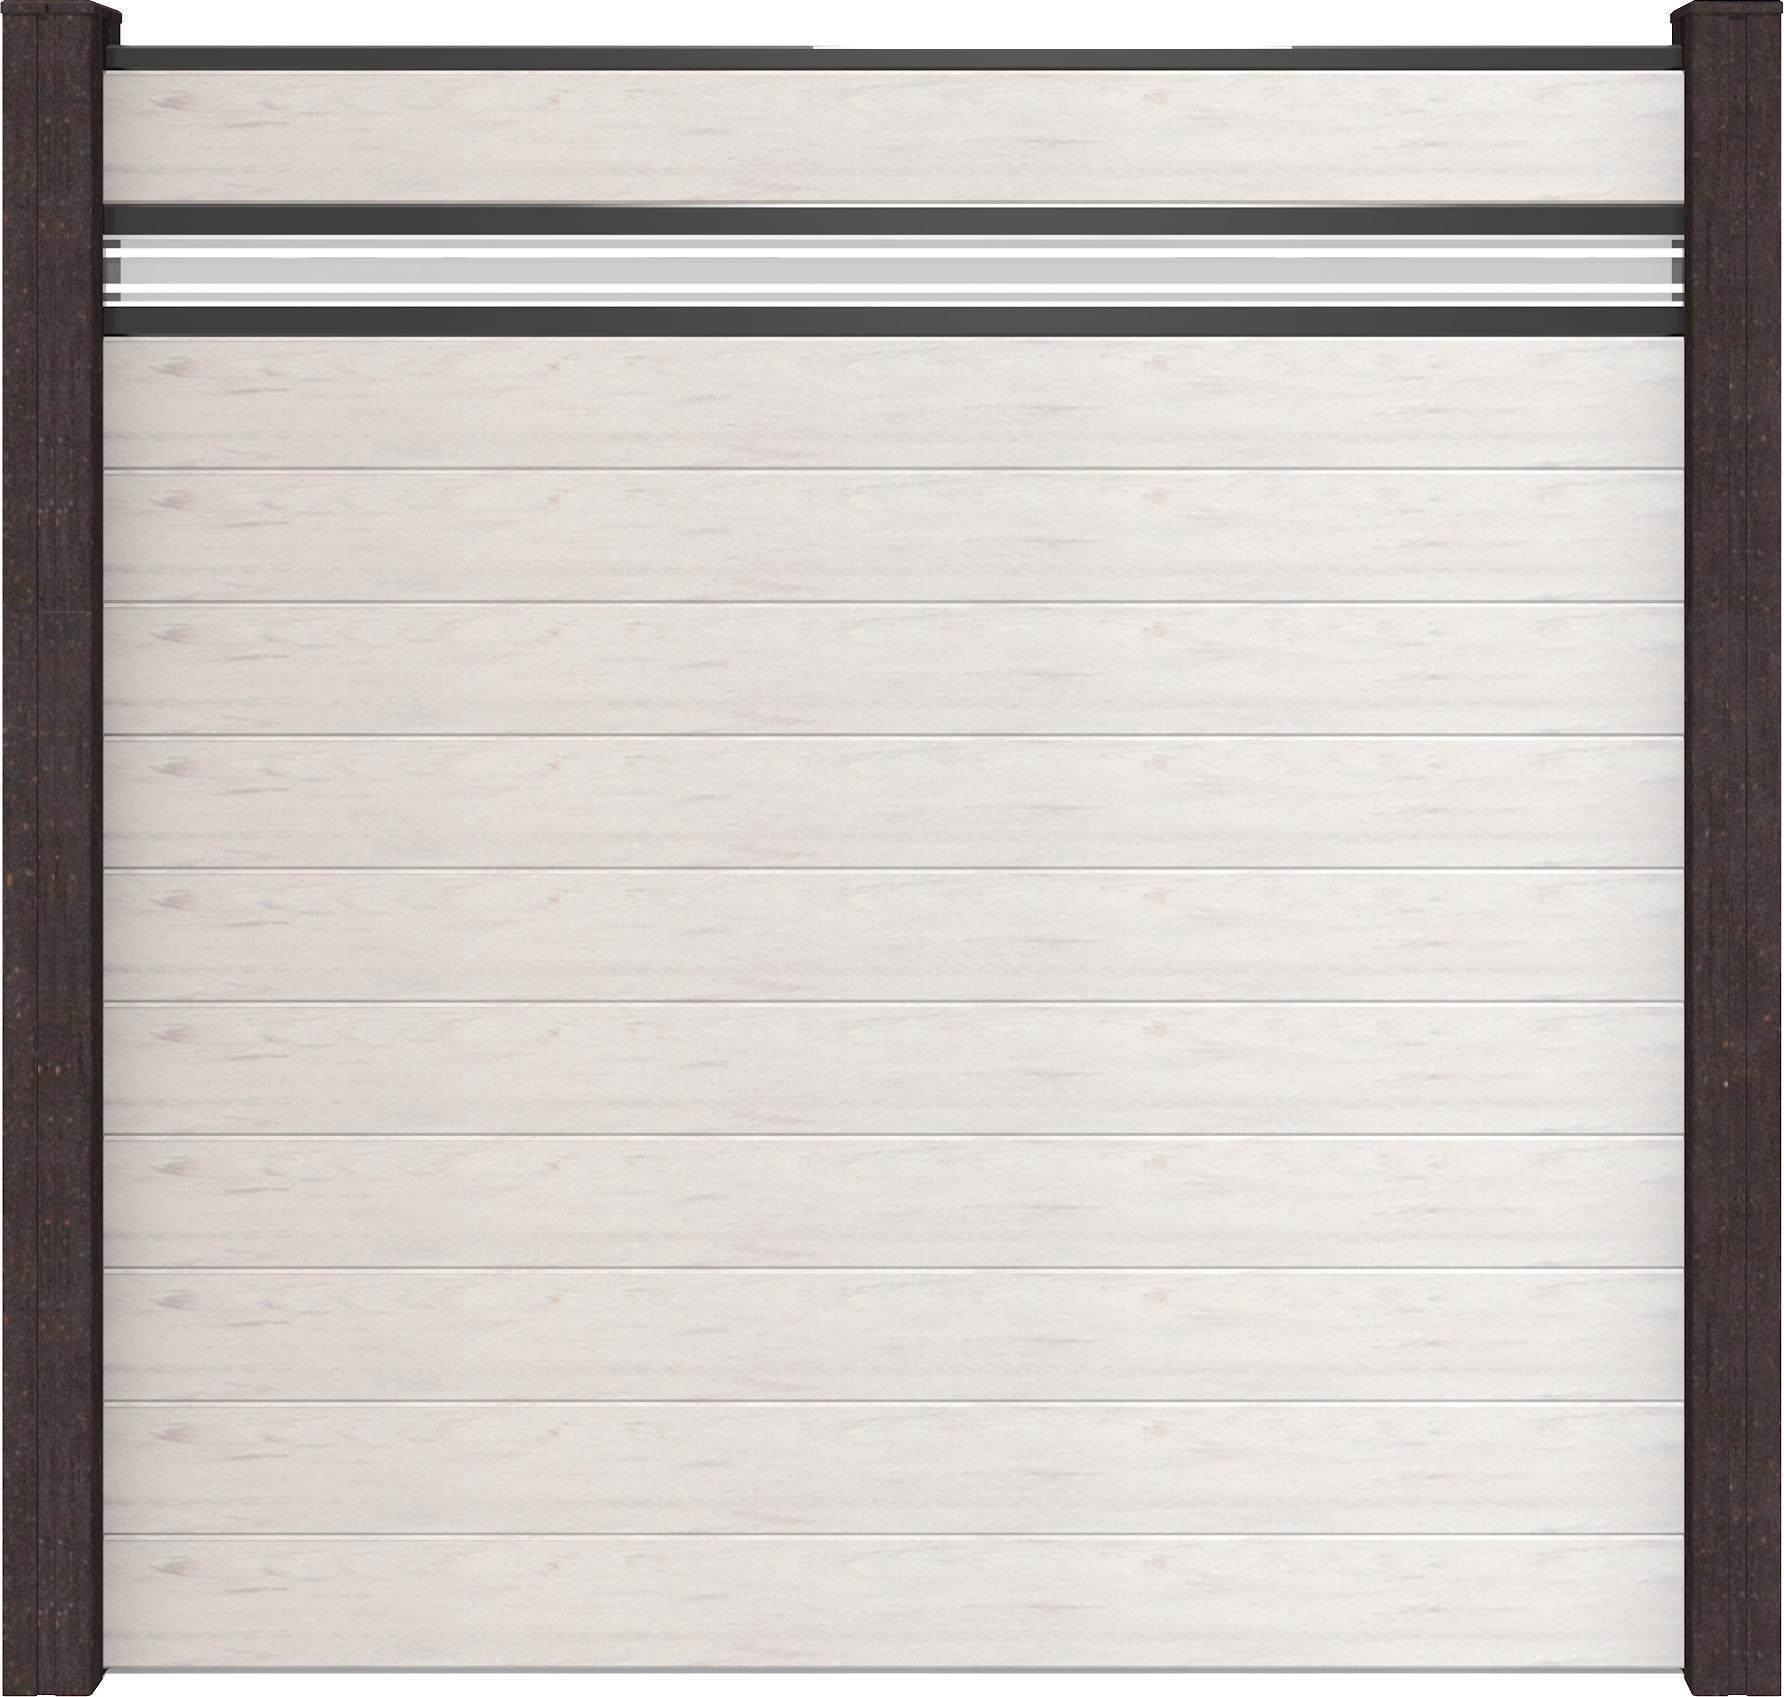 GrojaSolid BPC Glas 15 Stecksystem 180x180x1 9 cm Bi Color Weiss